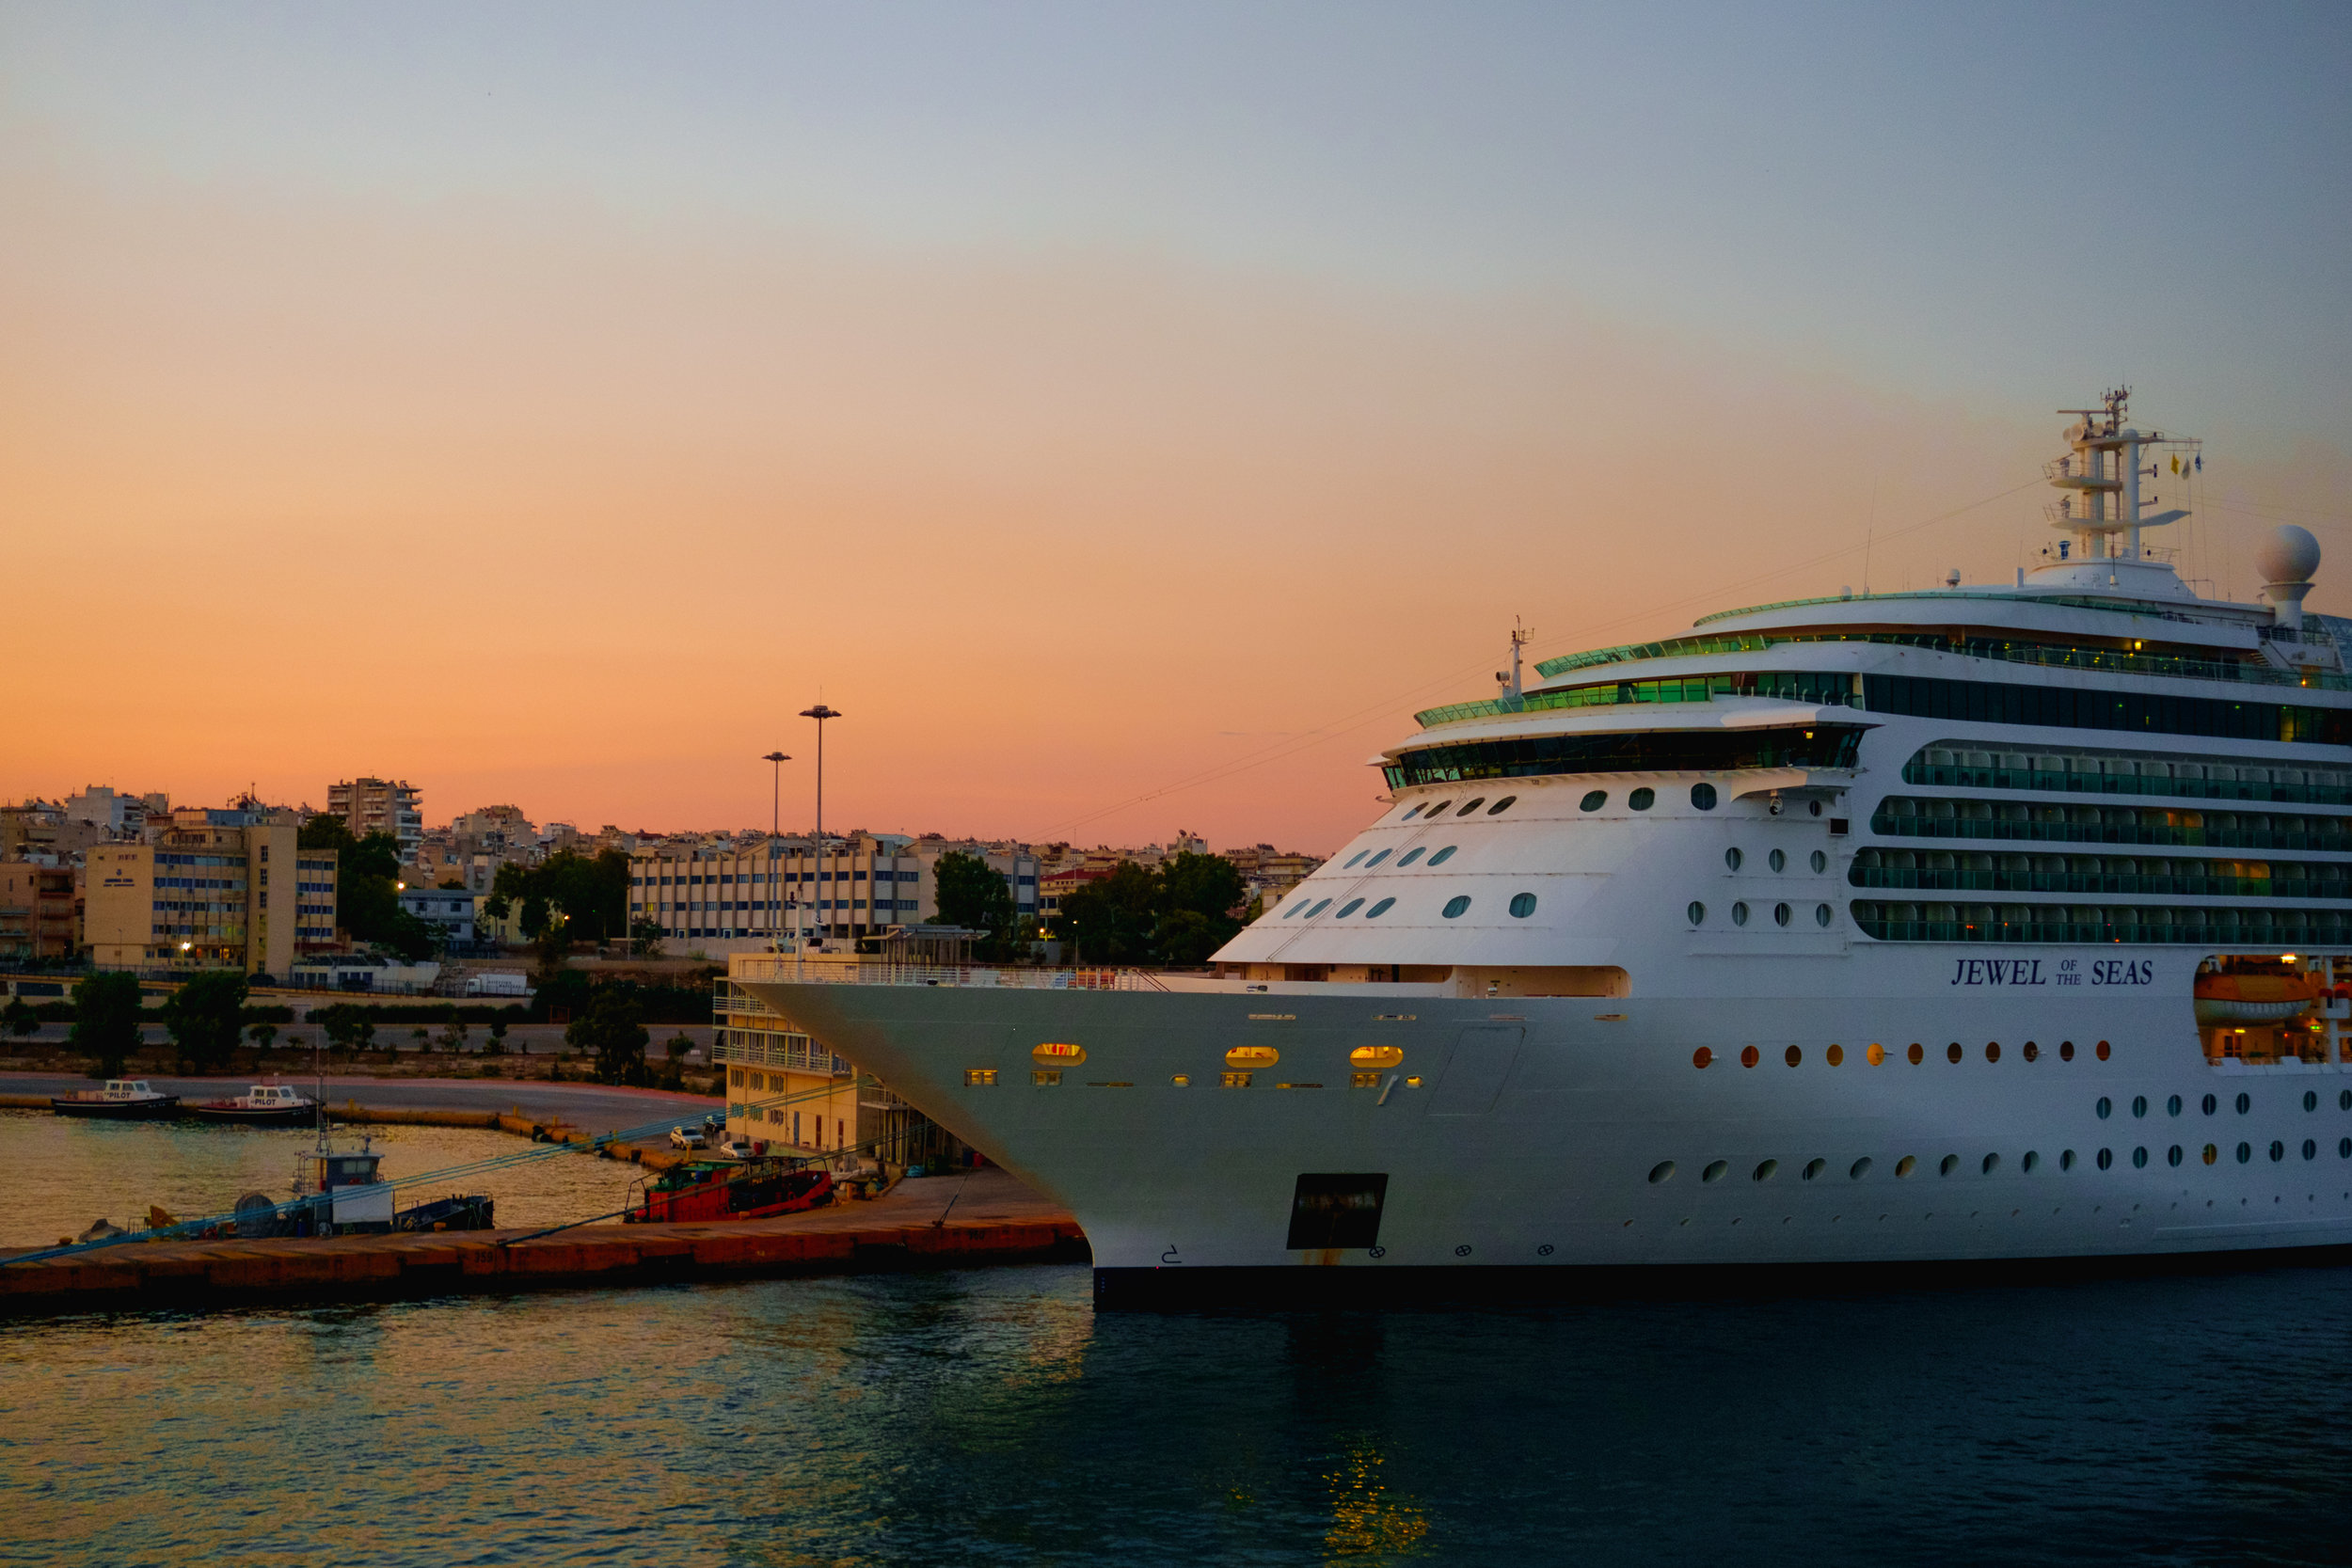 sunrise at port